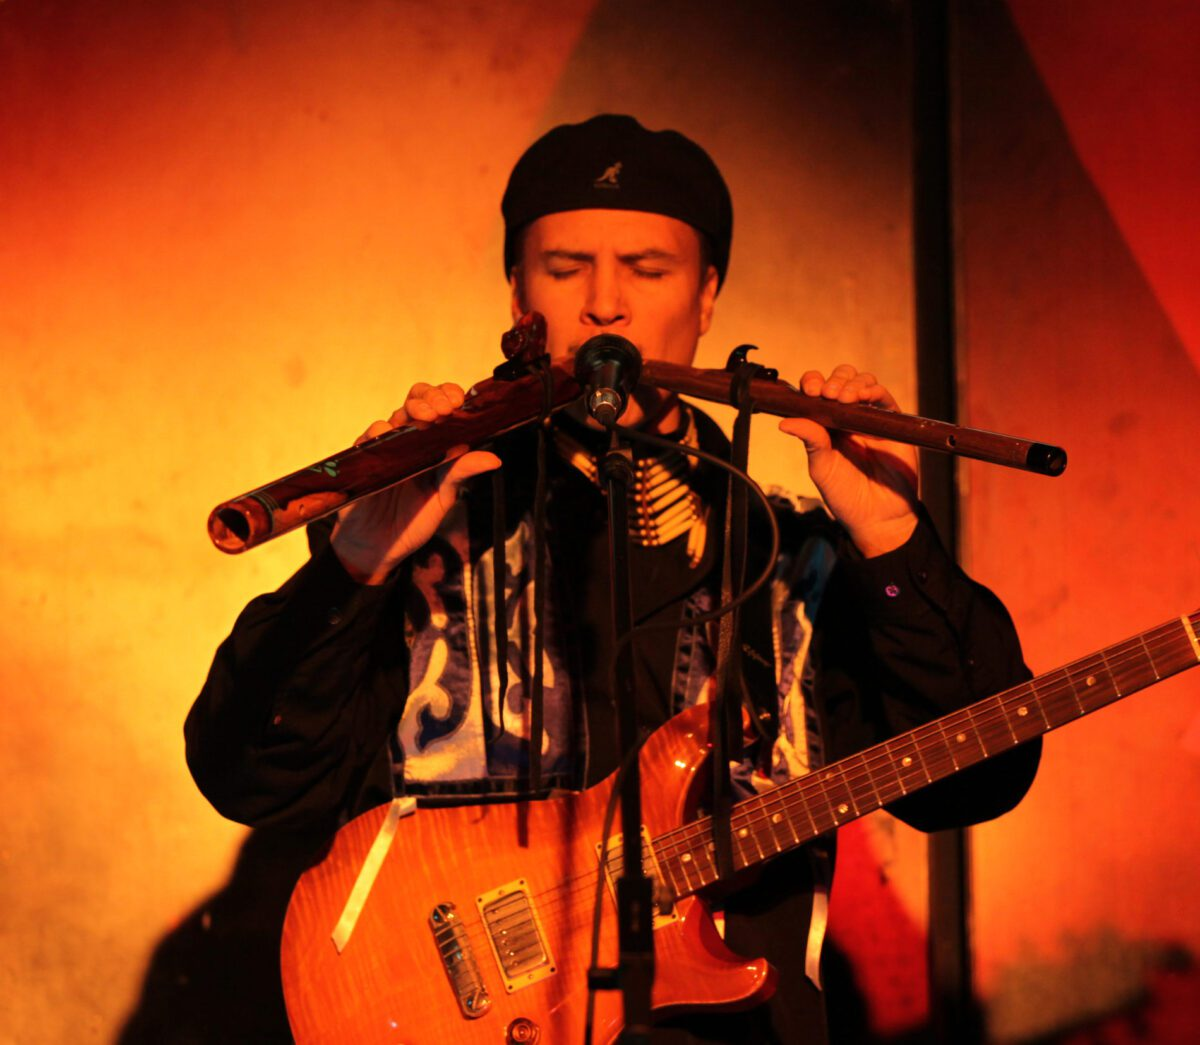 Wade Fernandez playing music